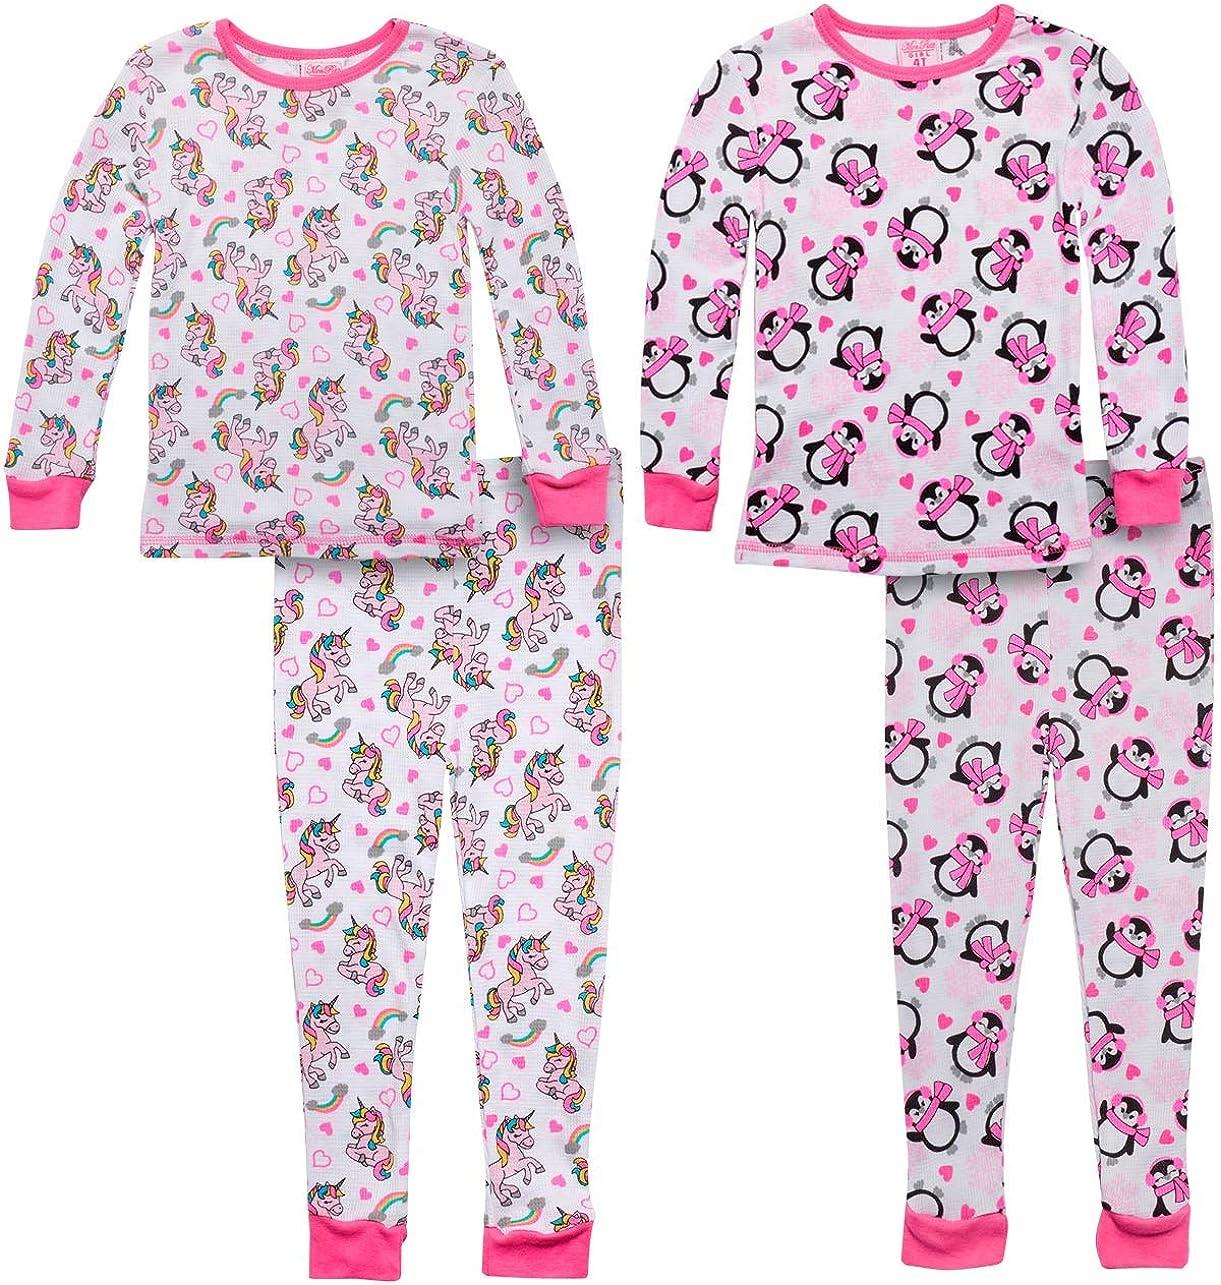 Mon Petit Baby Boys /& Girls Thermal Pajama Pant Sets with Fun Prints Infant /& Toddler 2-Pack